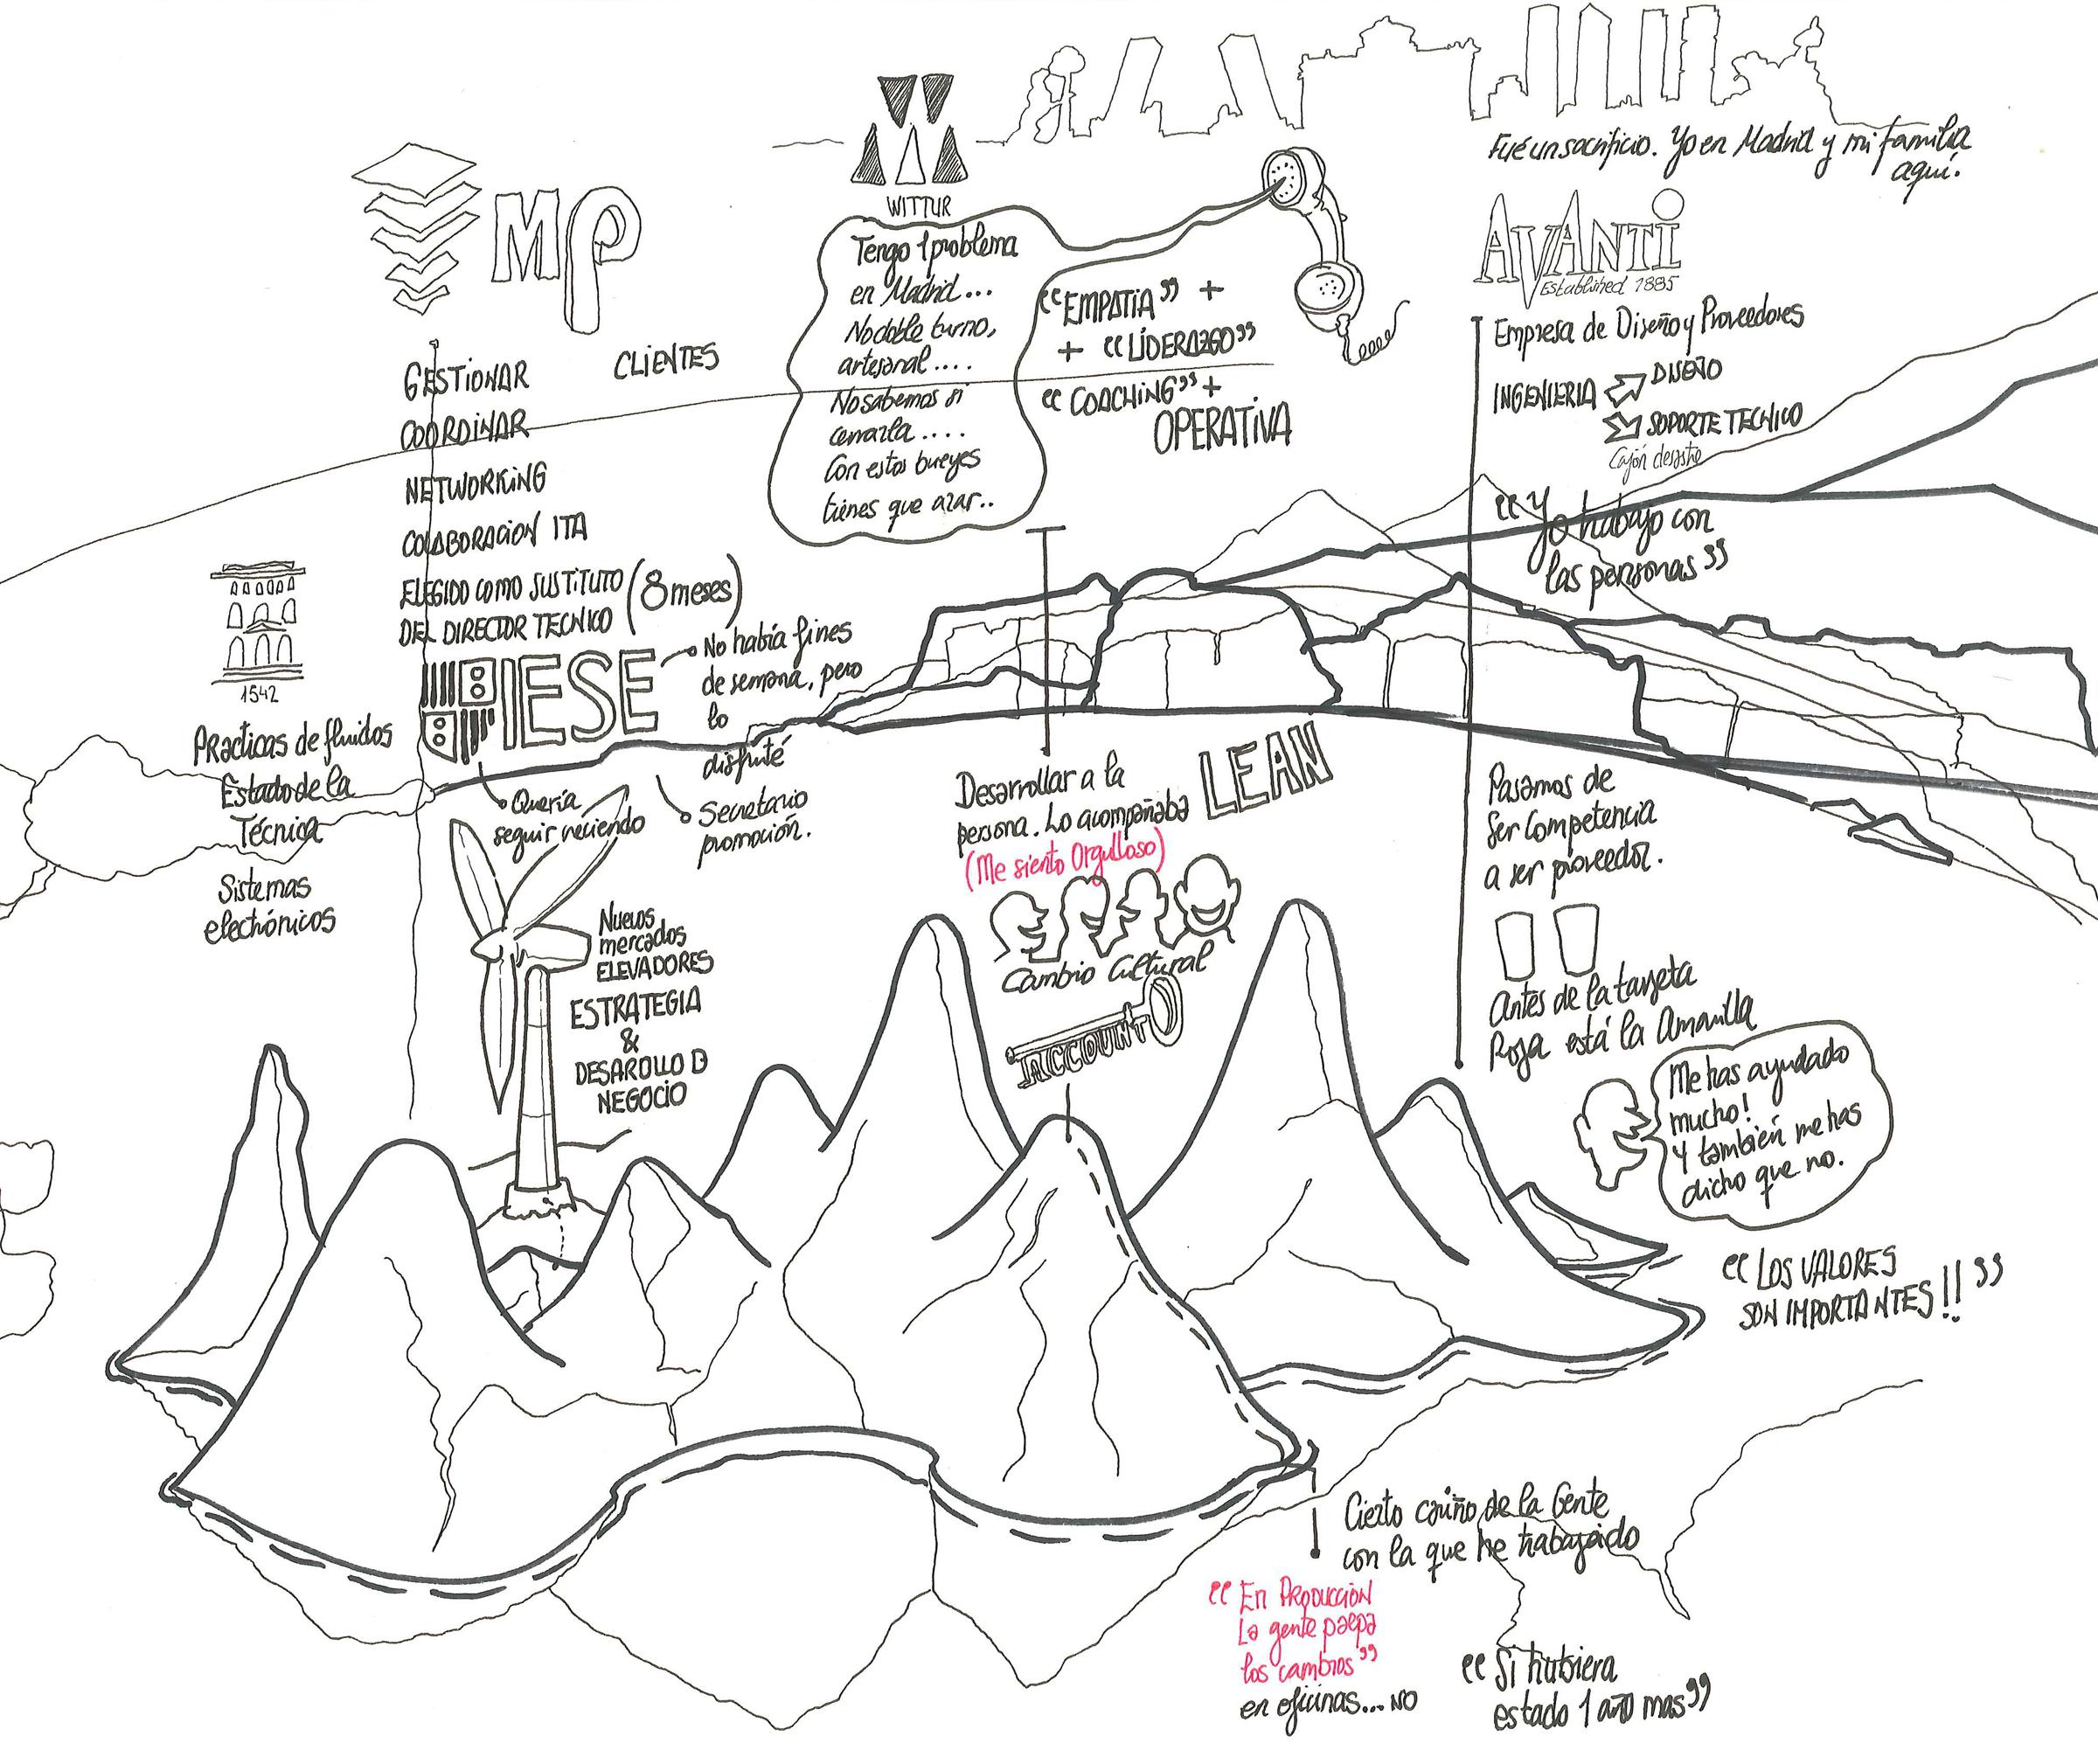 Curriculum Vitae Visual | Fernando Abadía